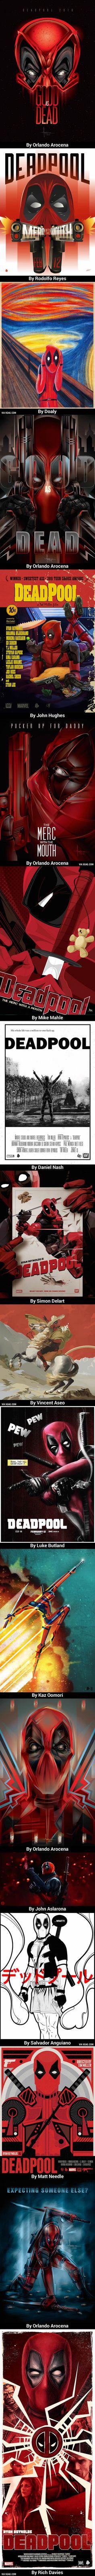 【Wham!】18 Incredible Deadpool Tributes